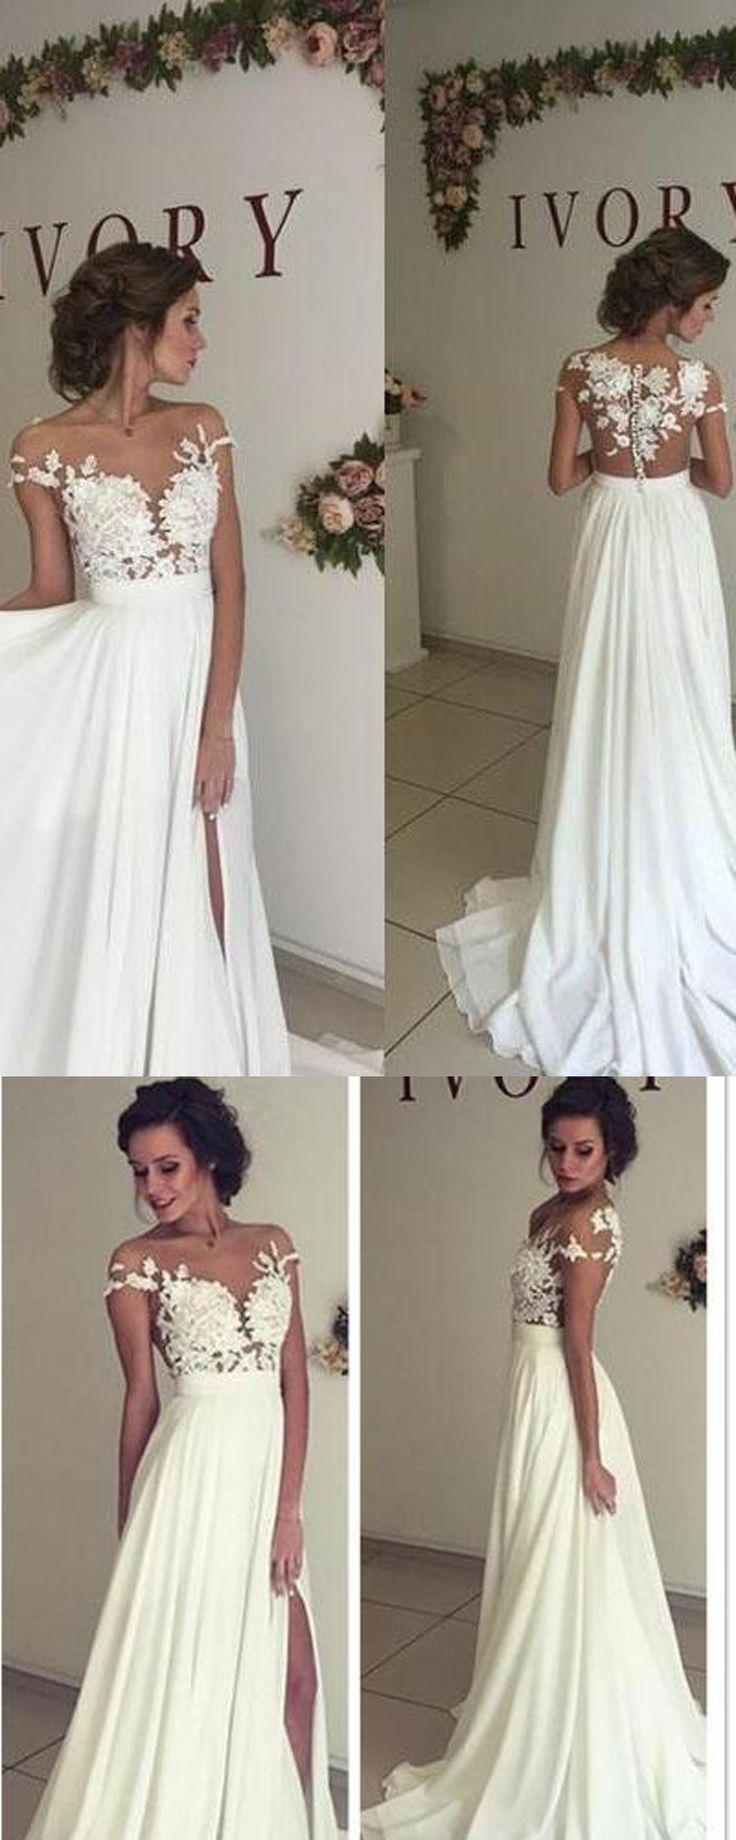 Off white short wedding dresses   best wedding images on Pinterest  Weddings Bohemian wedding